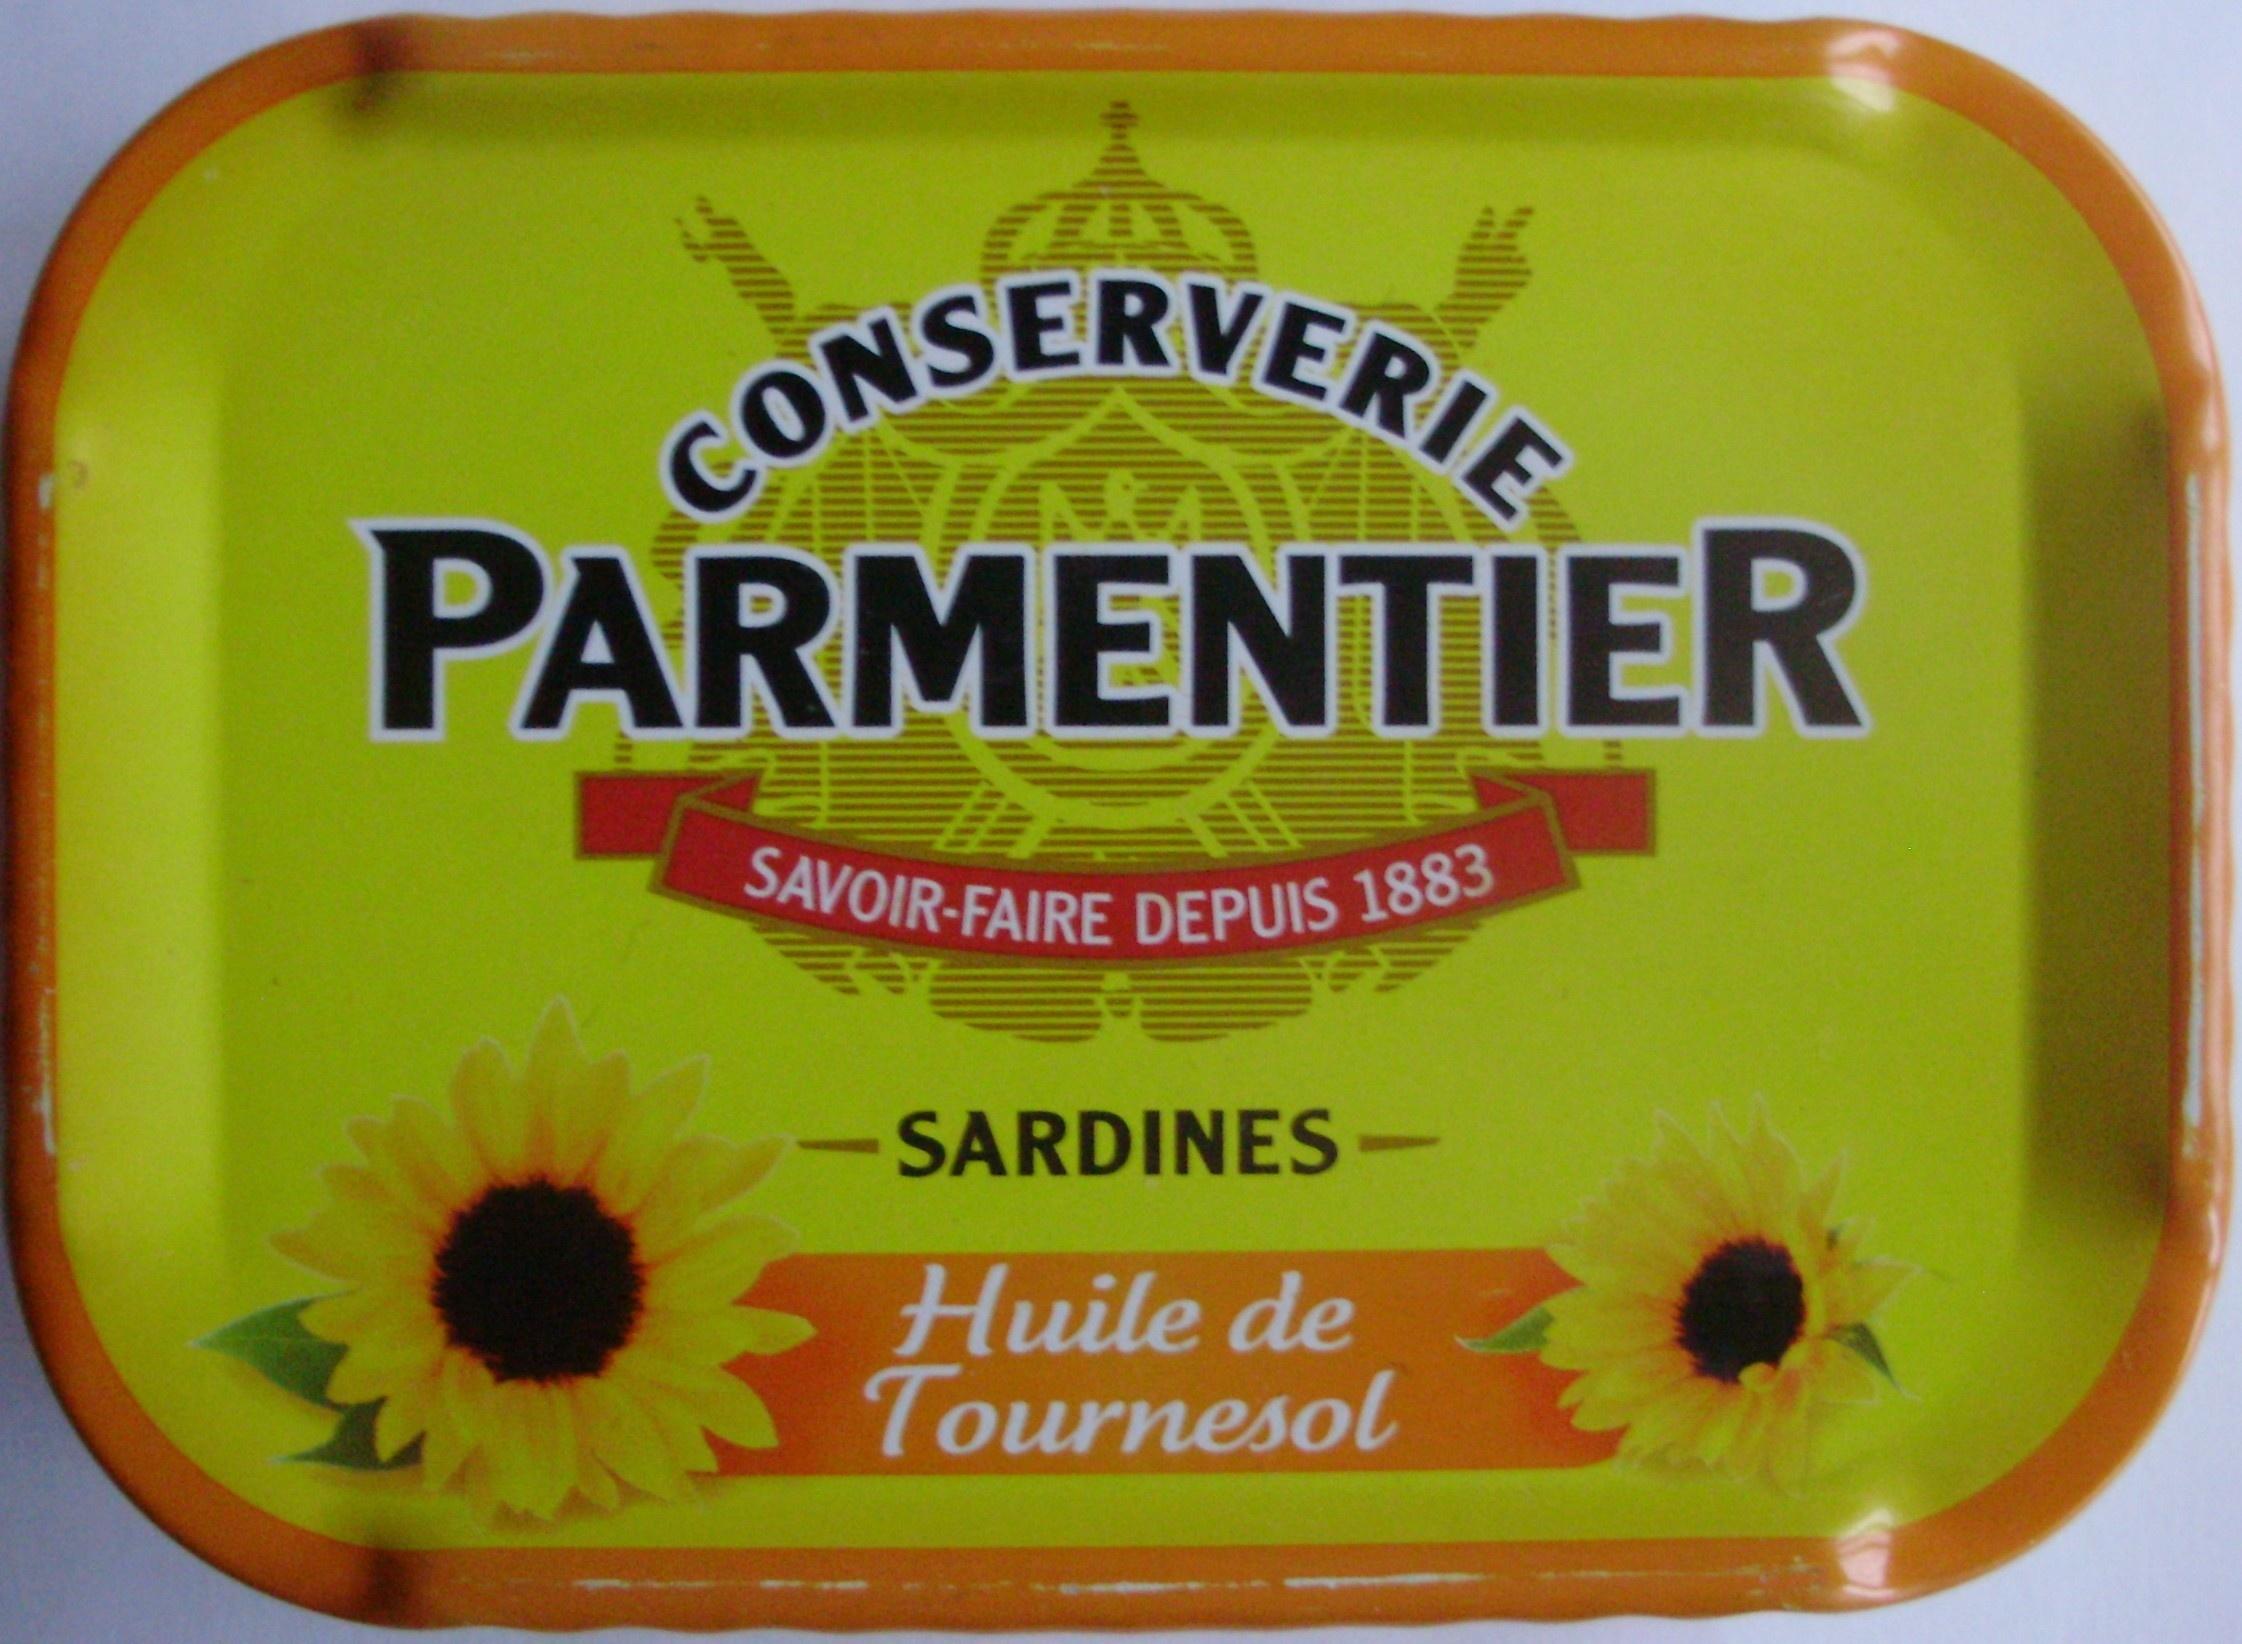 Sardines (Huile de Tournesol) - Product